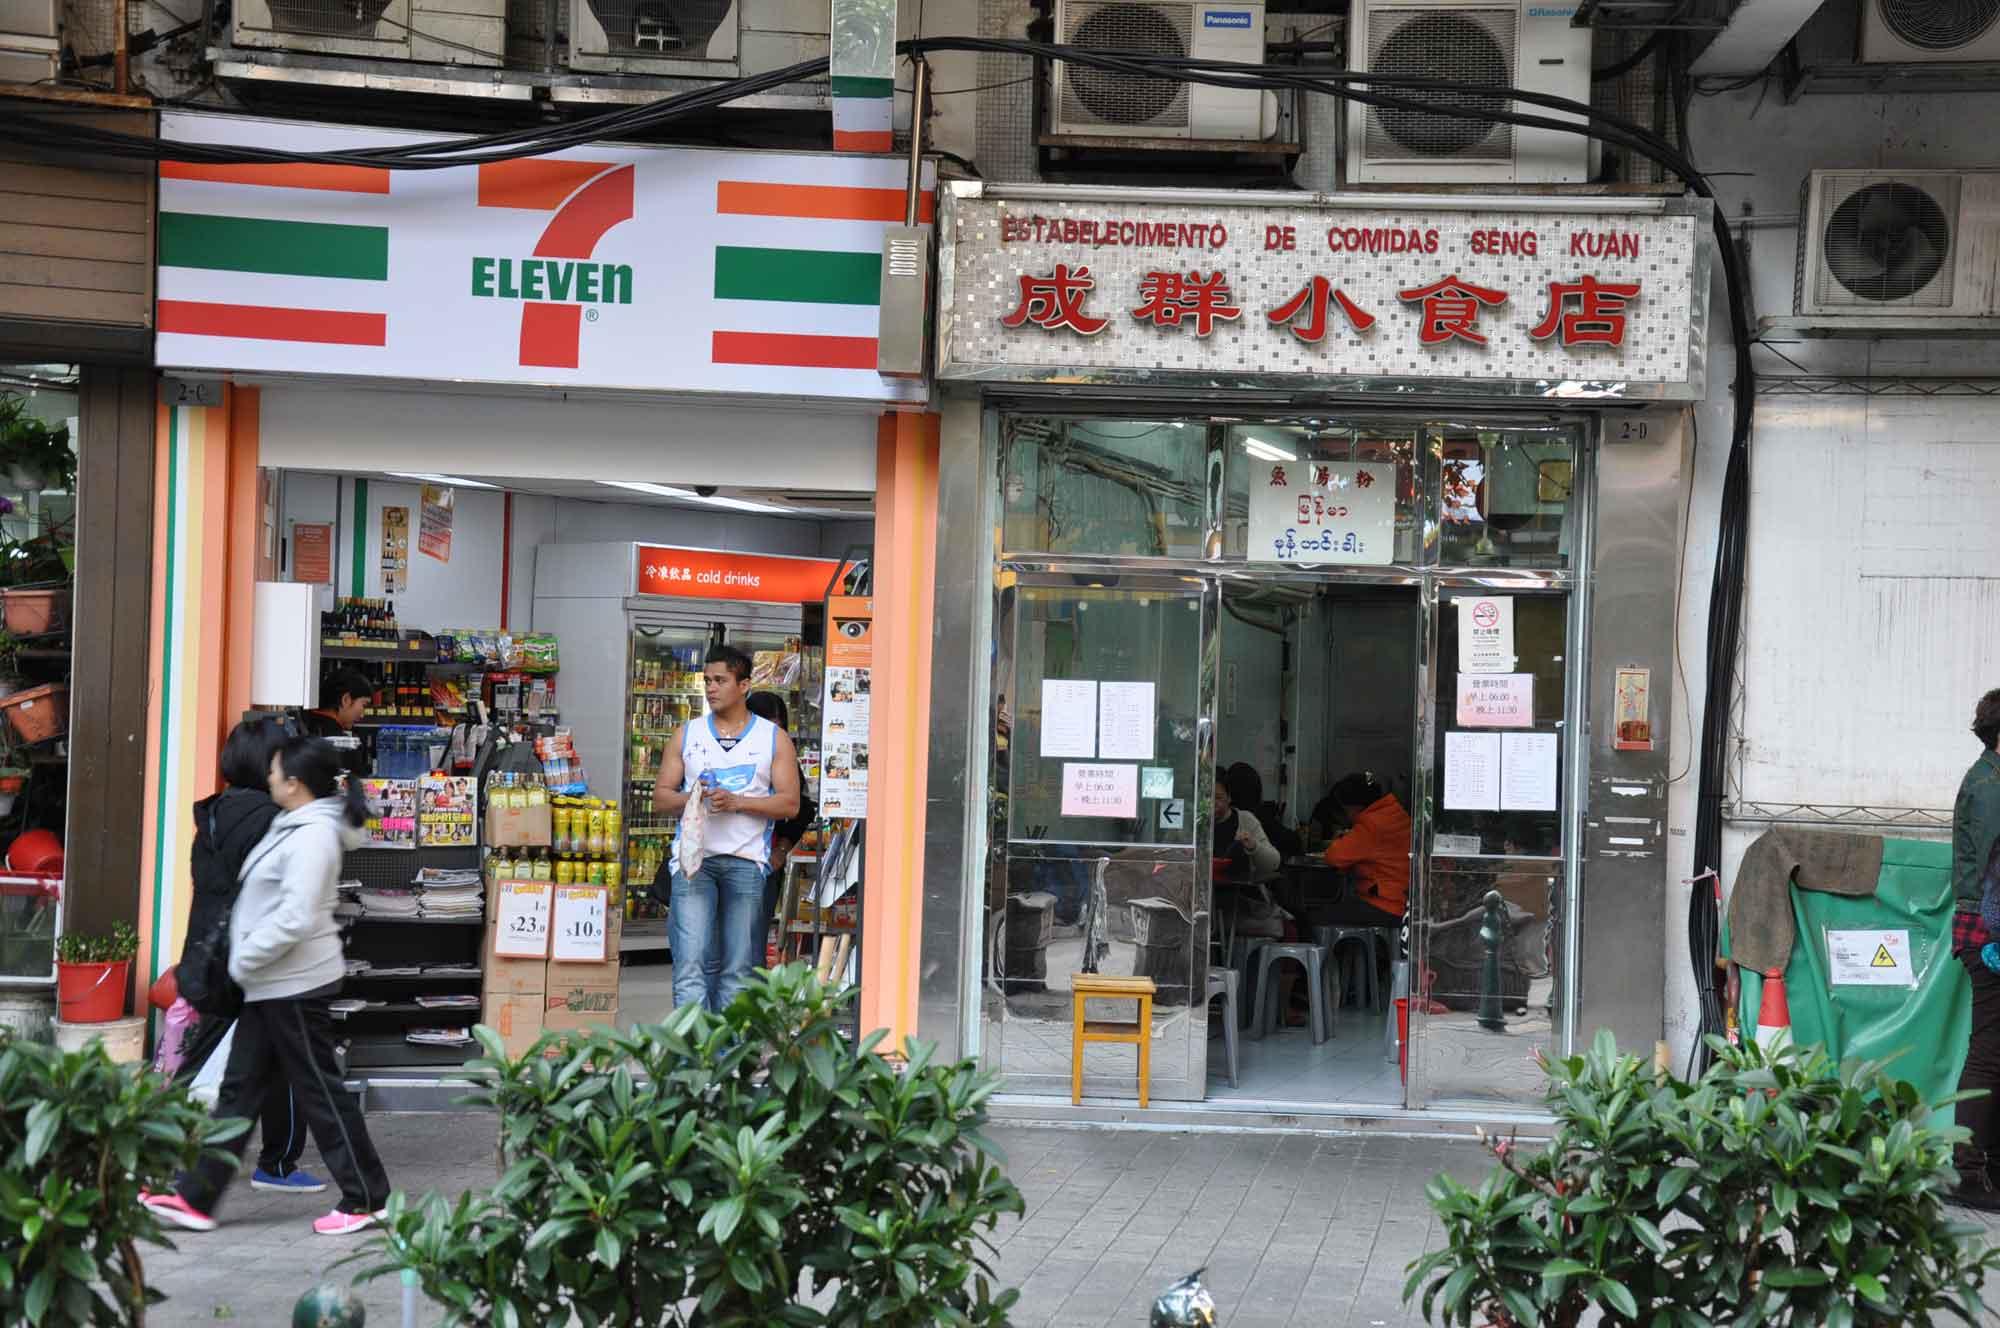 Seng Kuan Macau